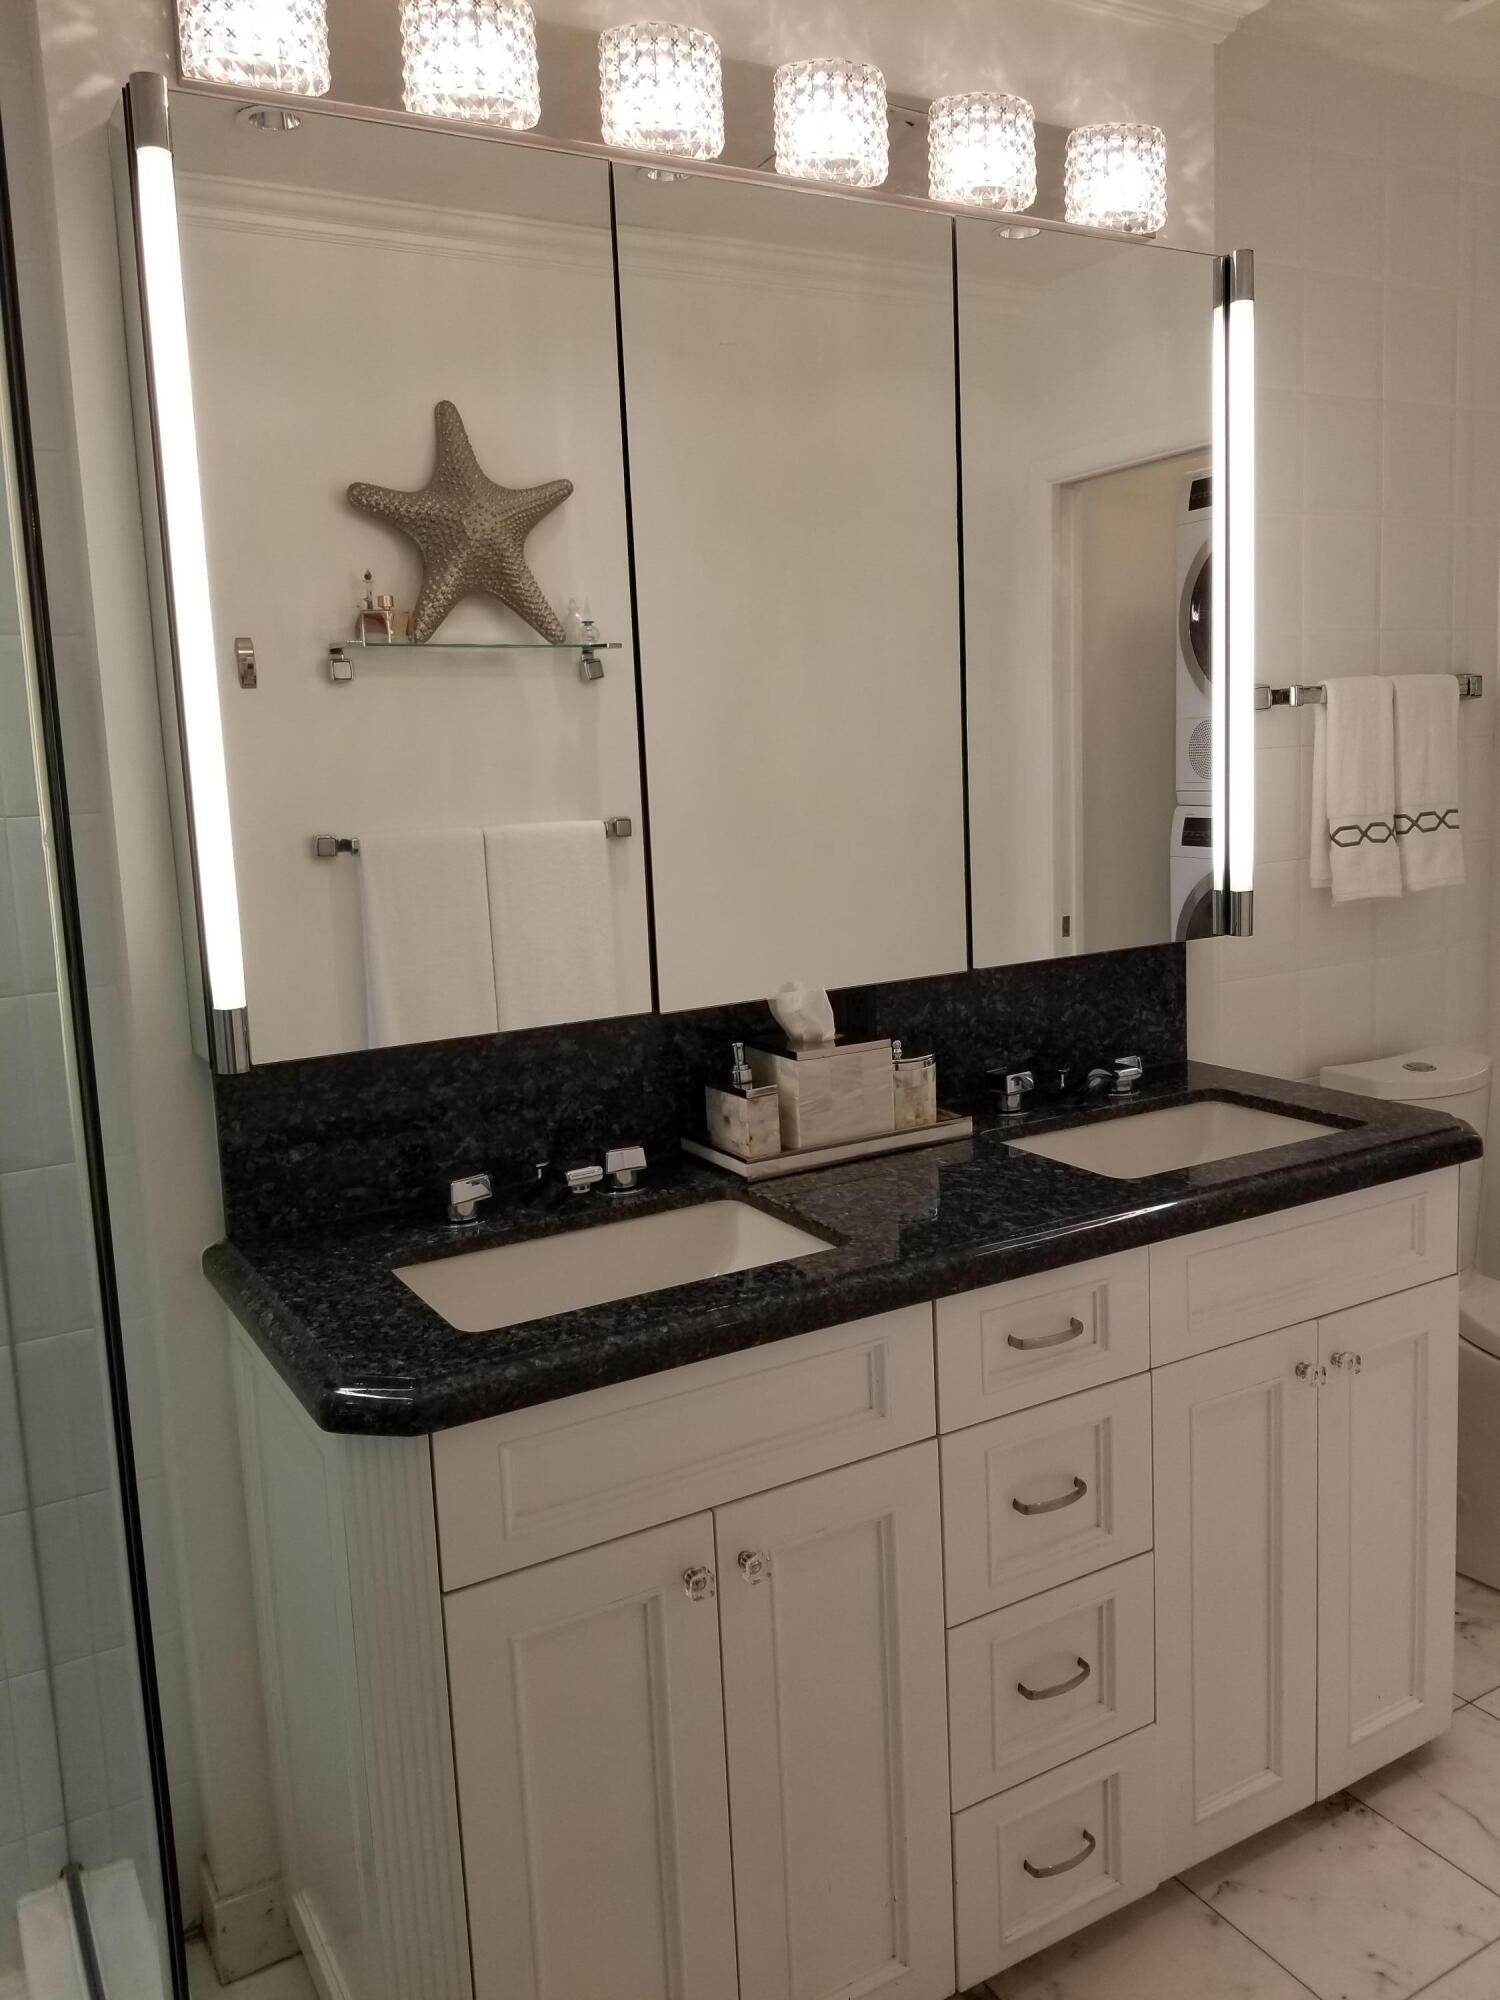 2175 master double sinks